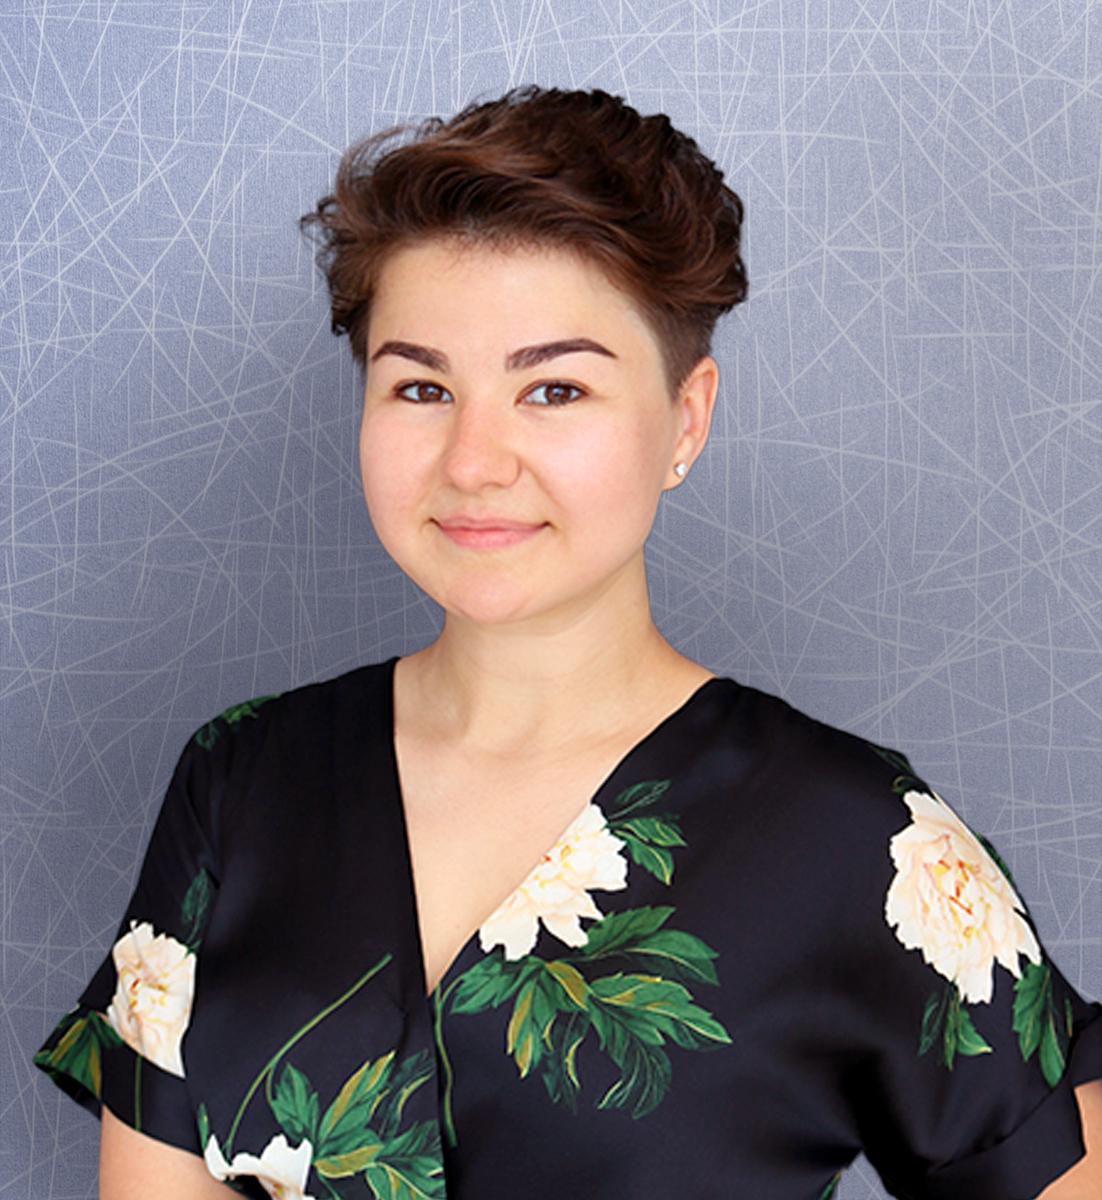 Anastasia Molchanova